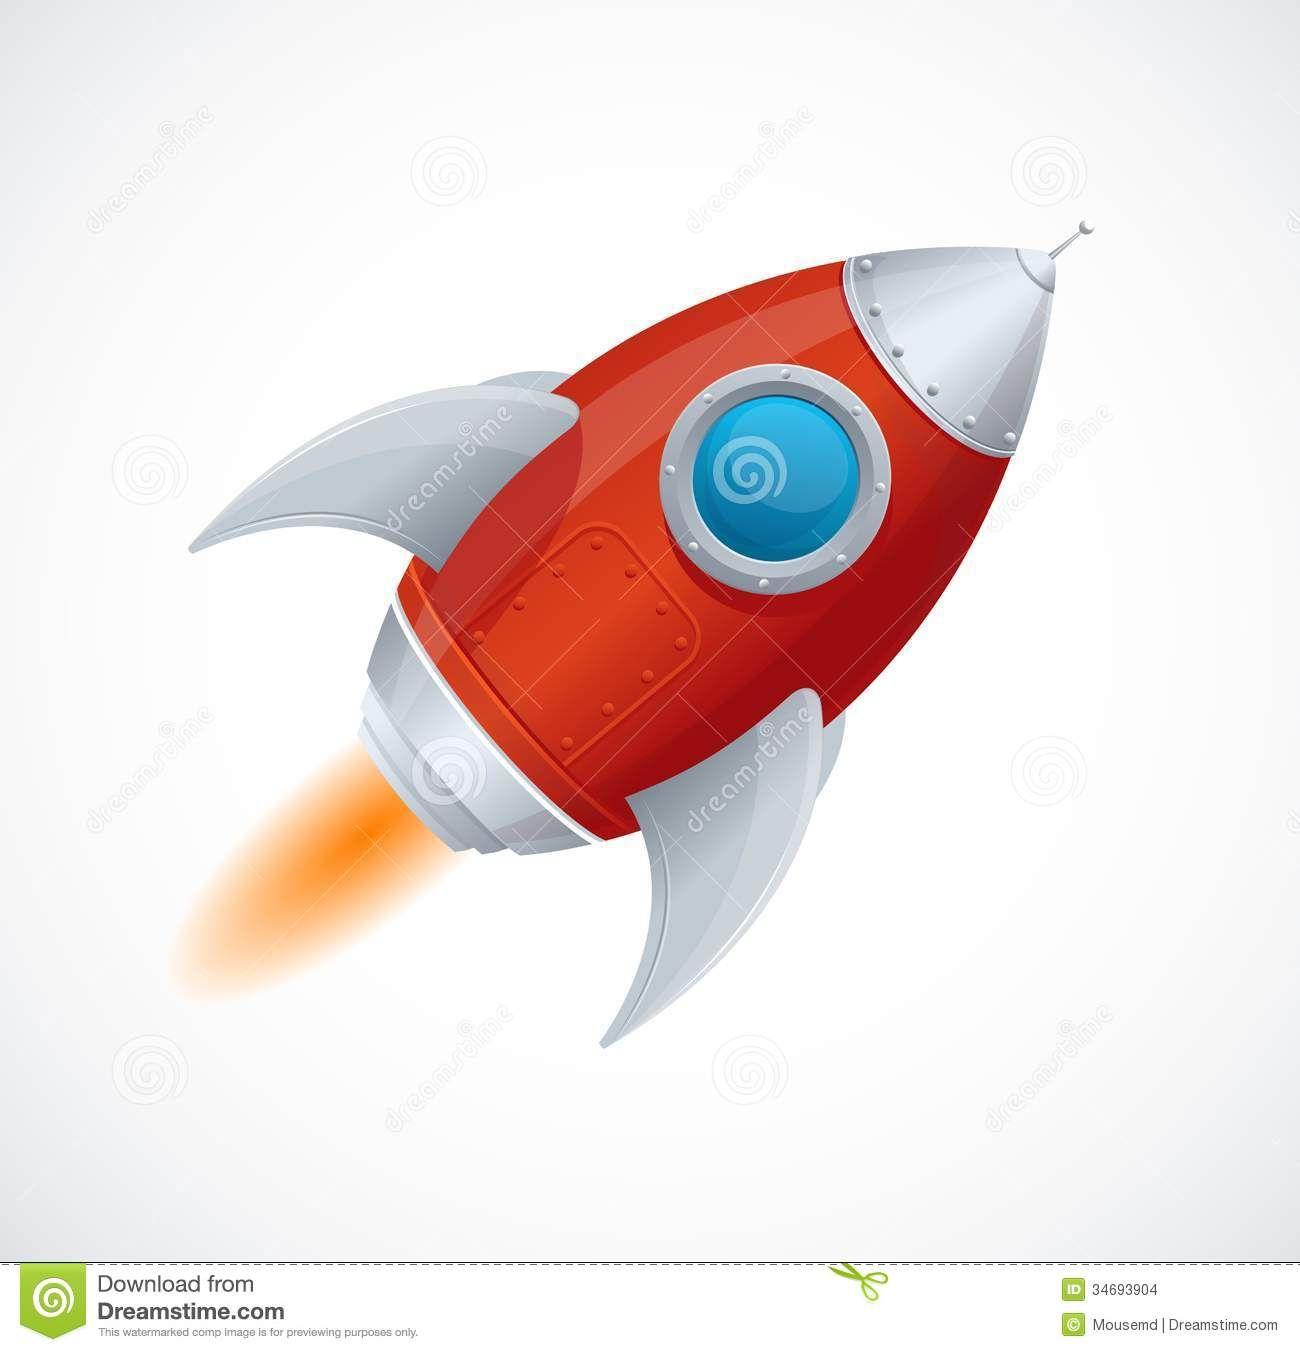 vintage spaceship - Google Search